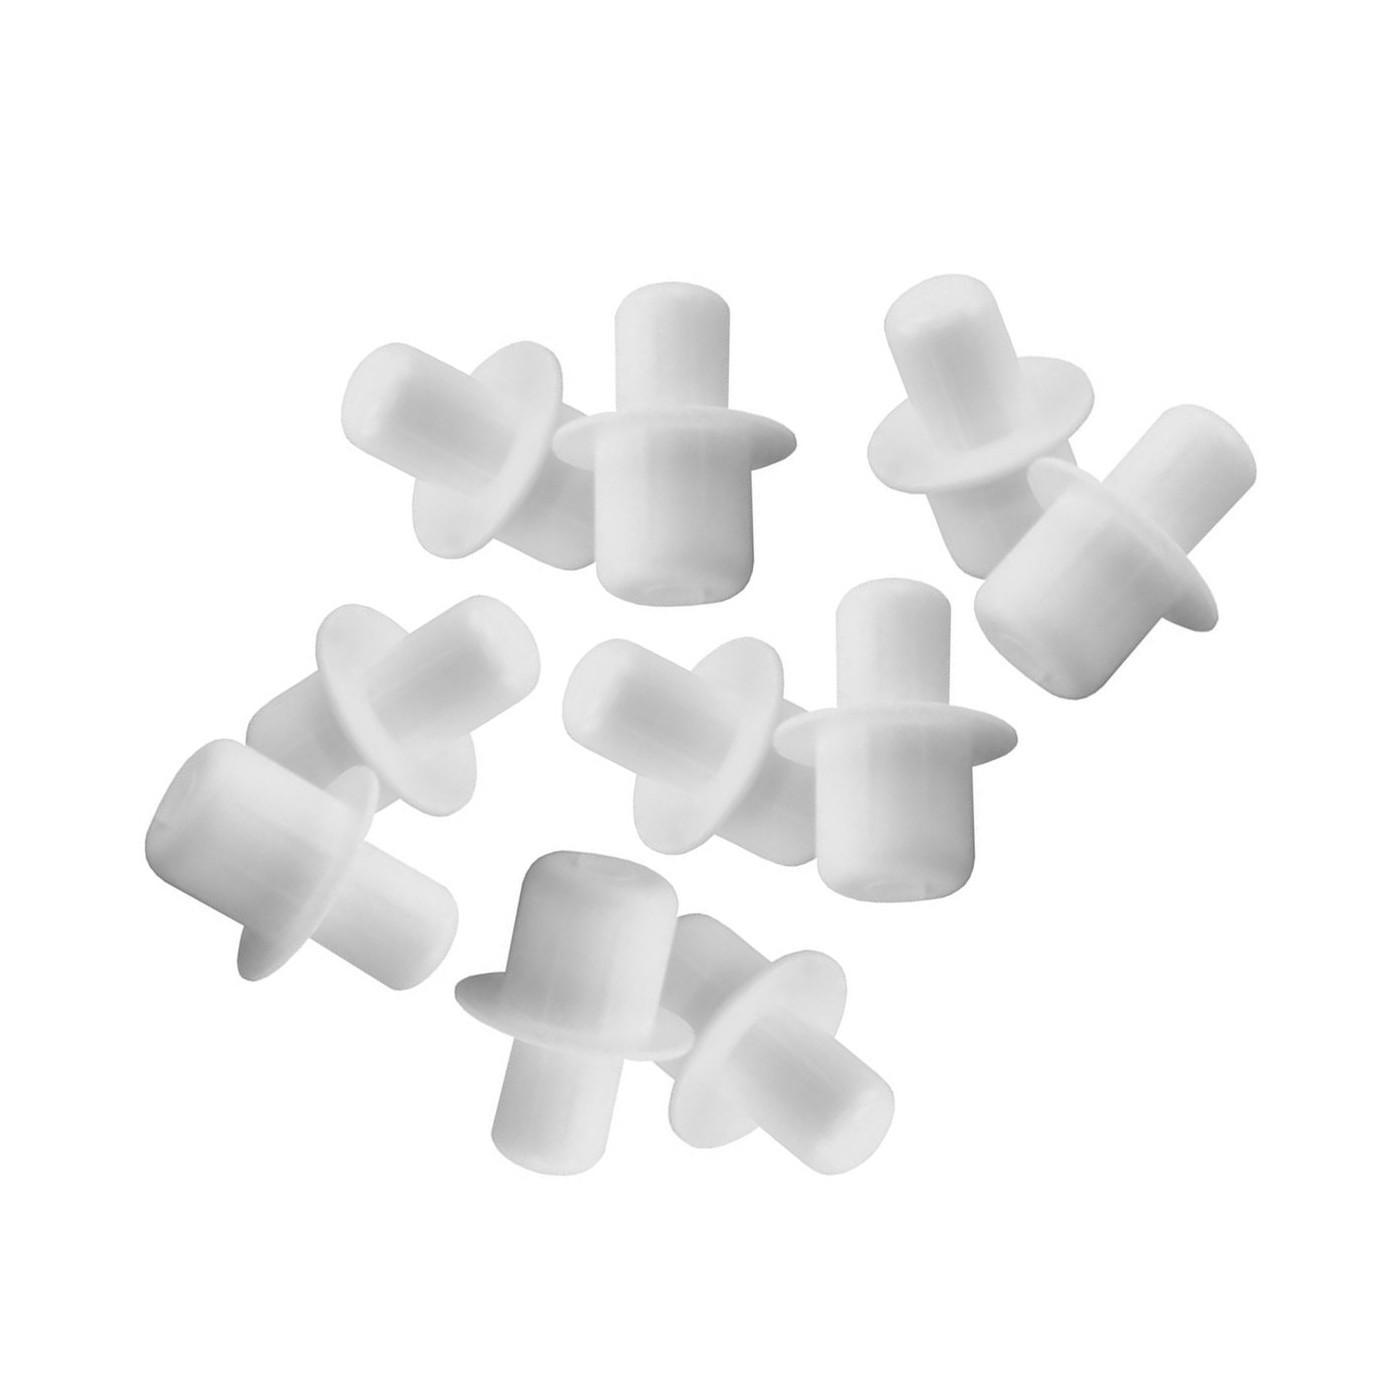 Set van 120 kunststof plankdragers (wit, 5&6 mm, 15 mm lengte)  - 1